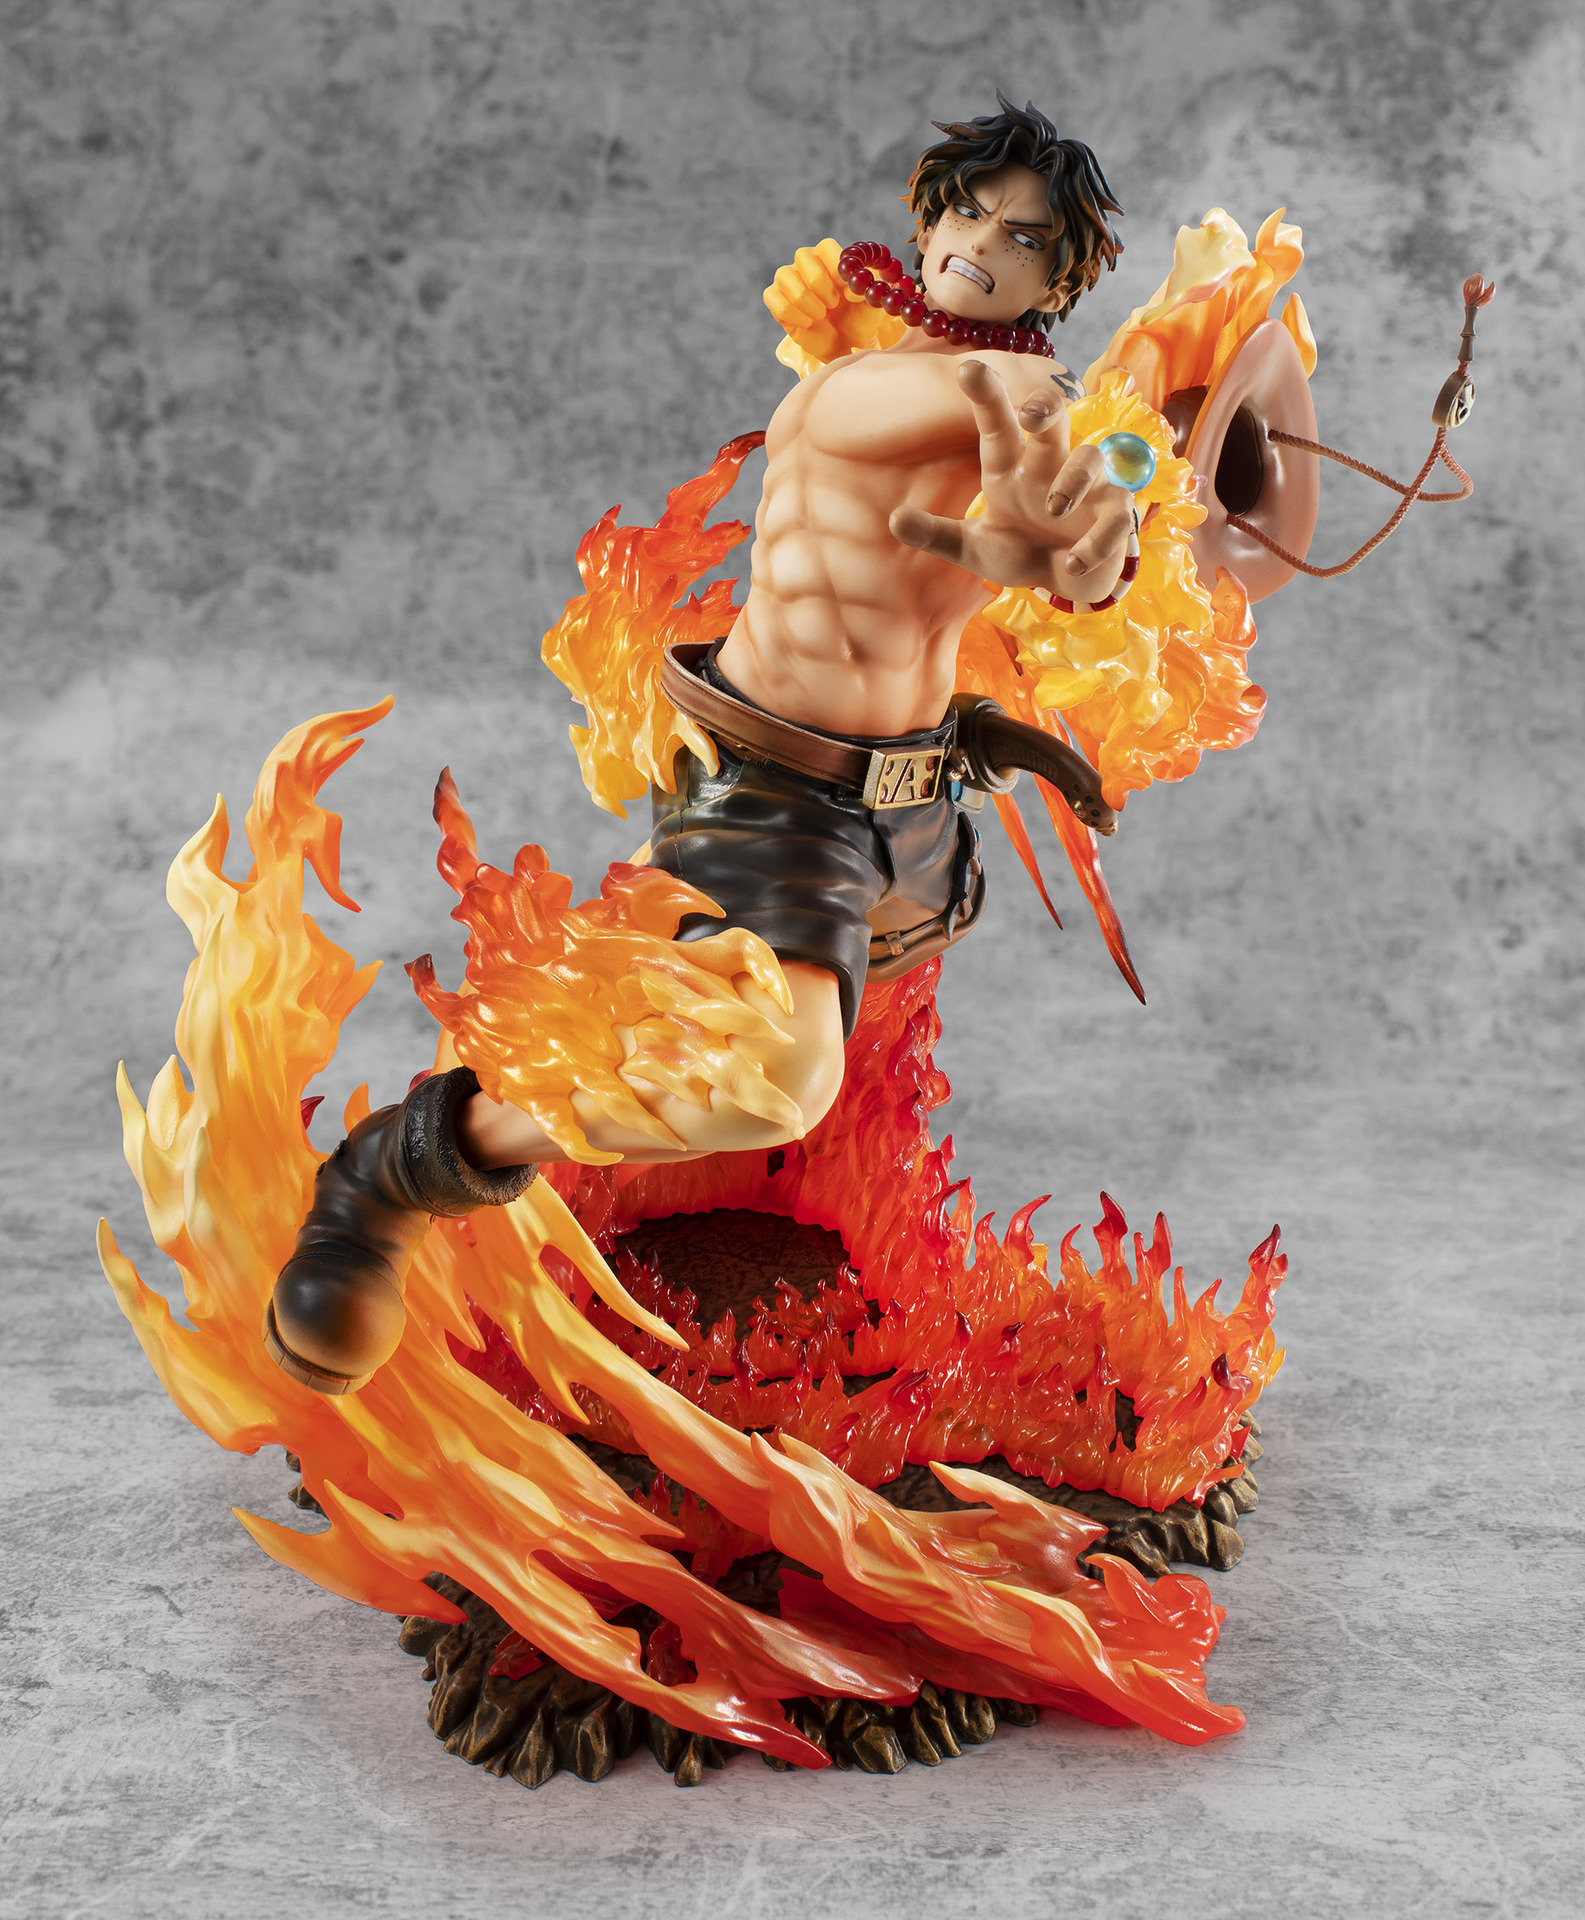 23cm One Piece ZERO Portgas D Ace Boa Hancock Battle Ver. Fleam PVC Action Figure Model Toys With Original Box Roronoa Zoro